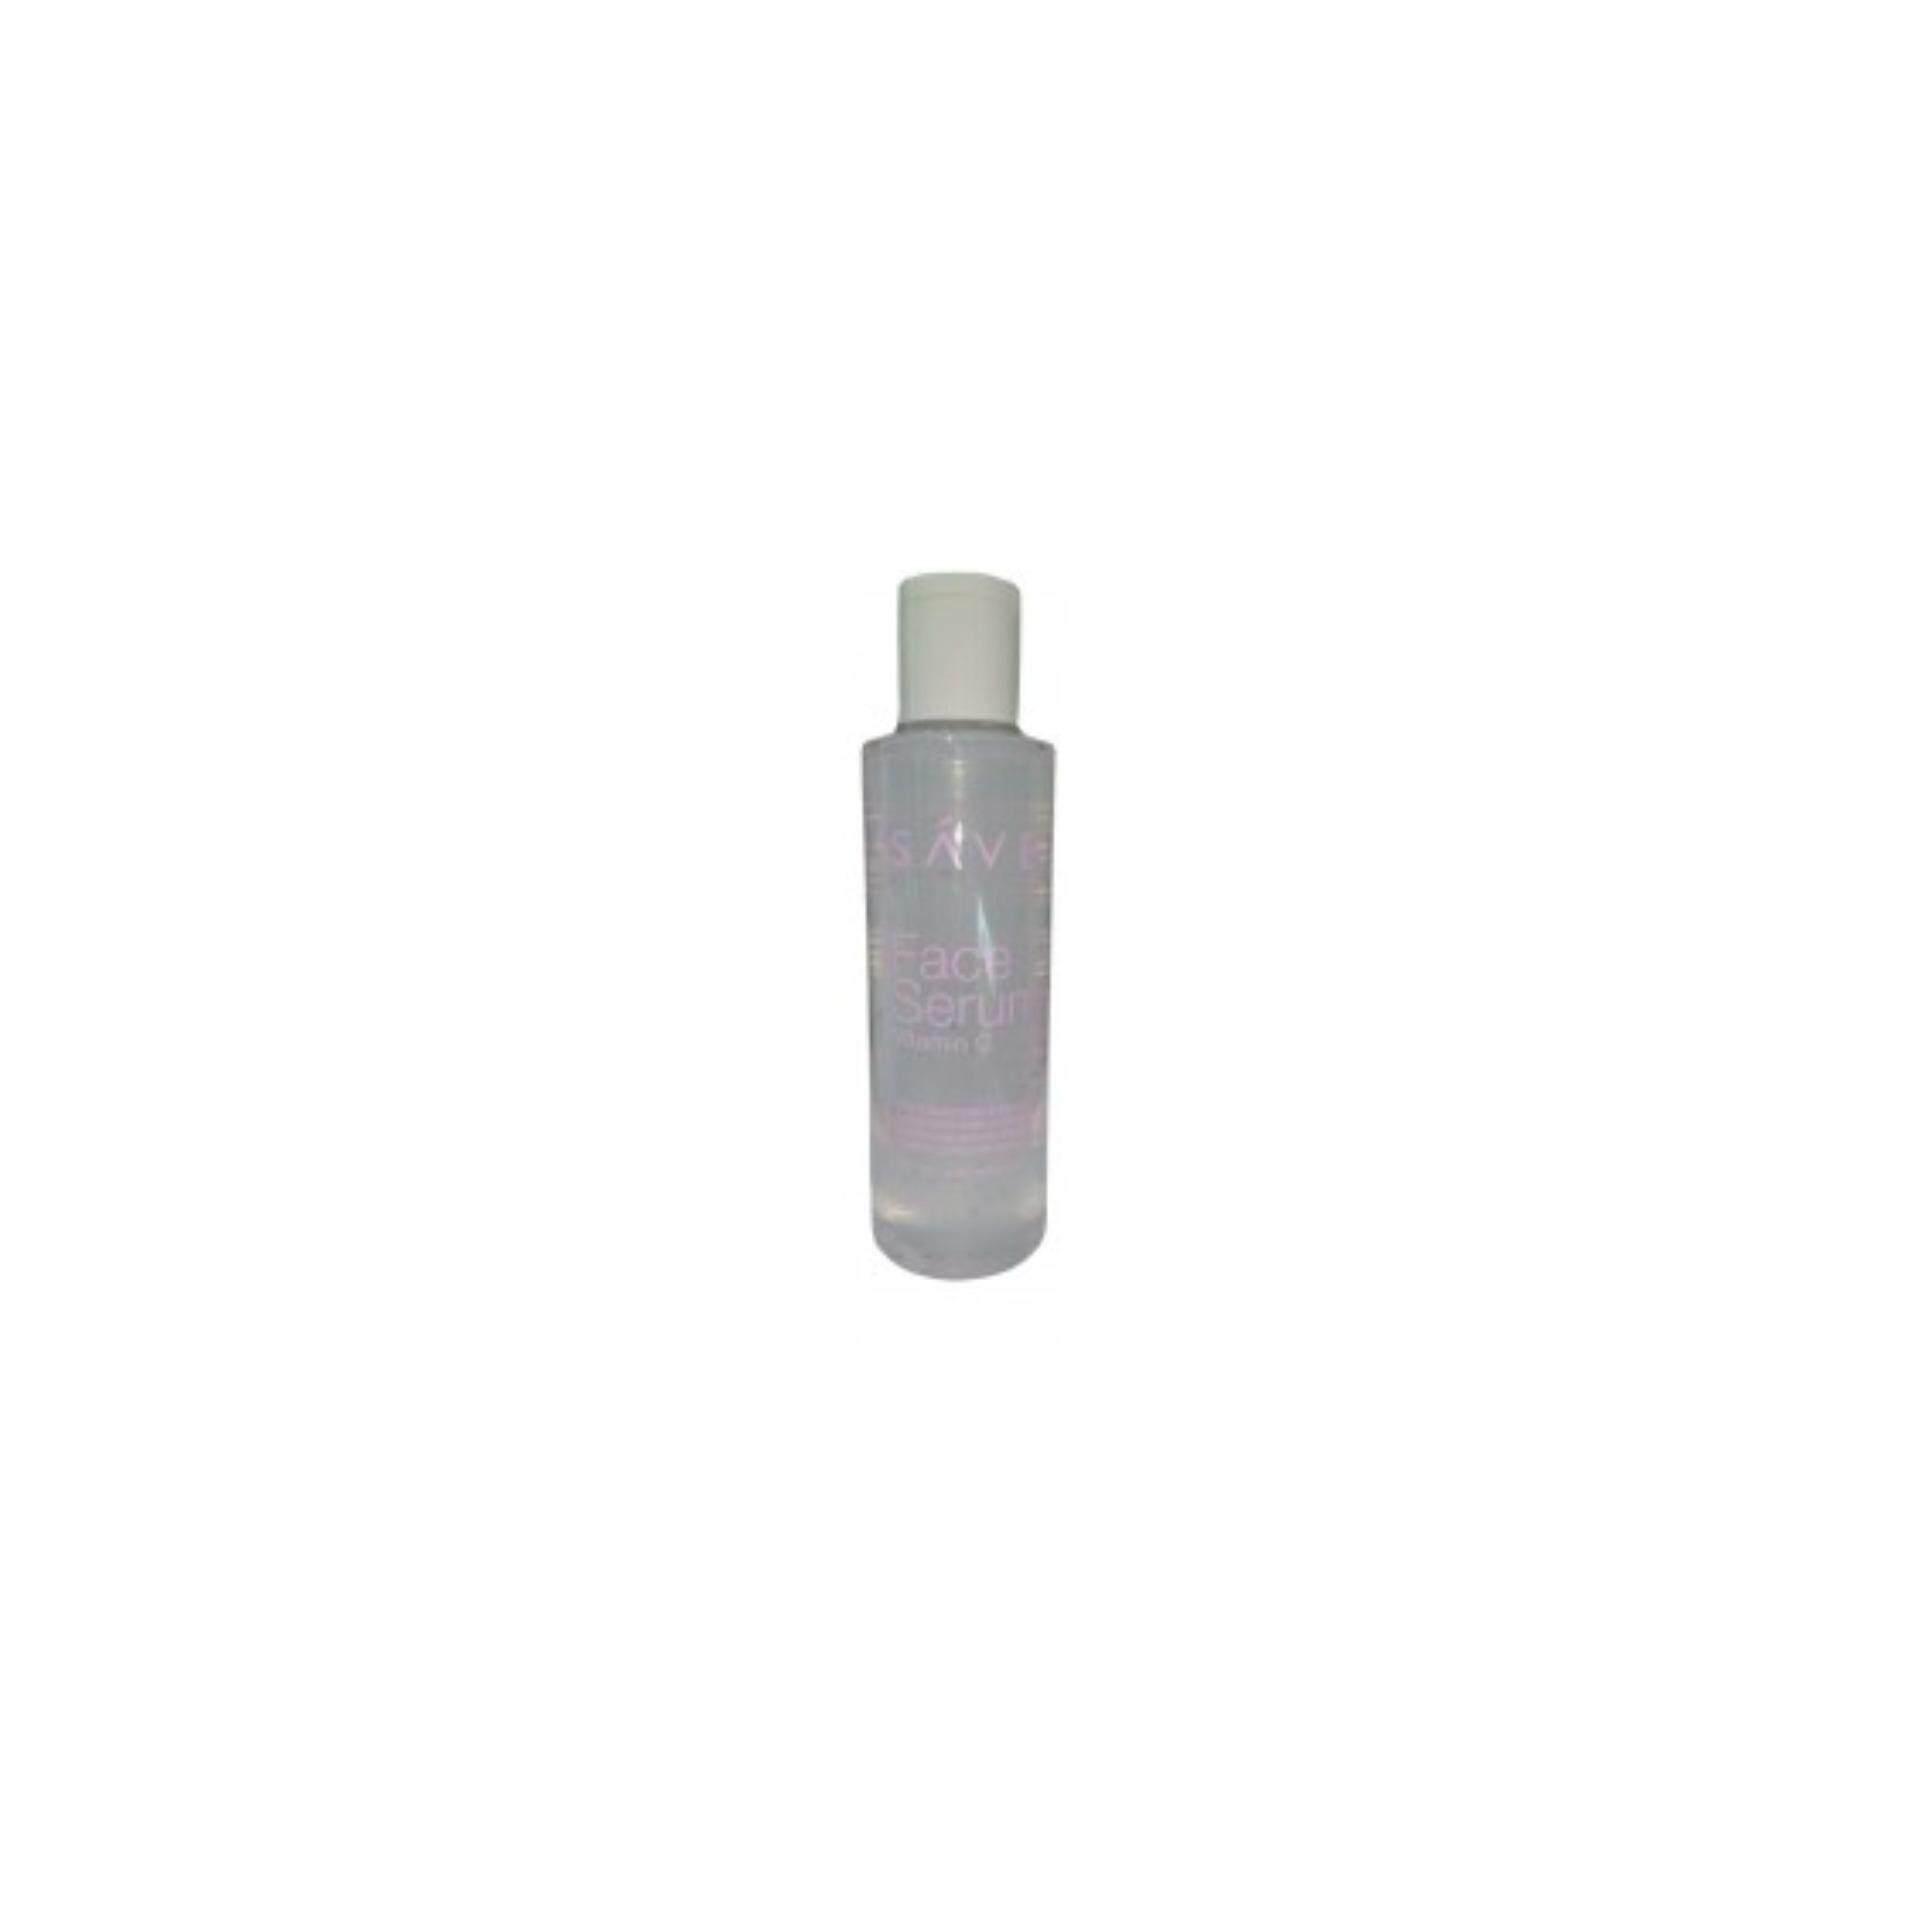 Serum Vitamin C Collagen Hanasui 2 Botol Daftar Harga Terlengkap Dermaroller System Paket Anastesi 10gr Dan Savee Face Cmyr15